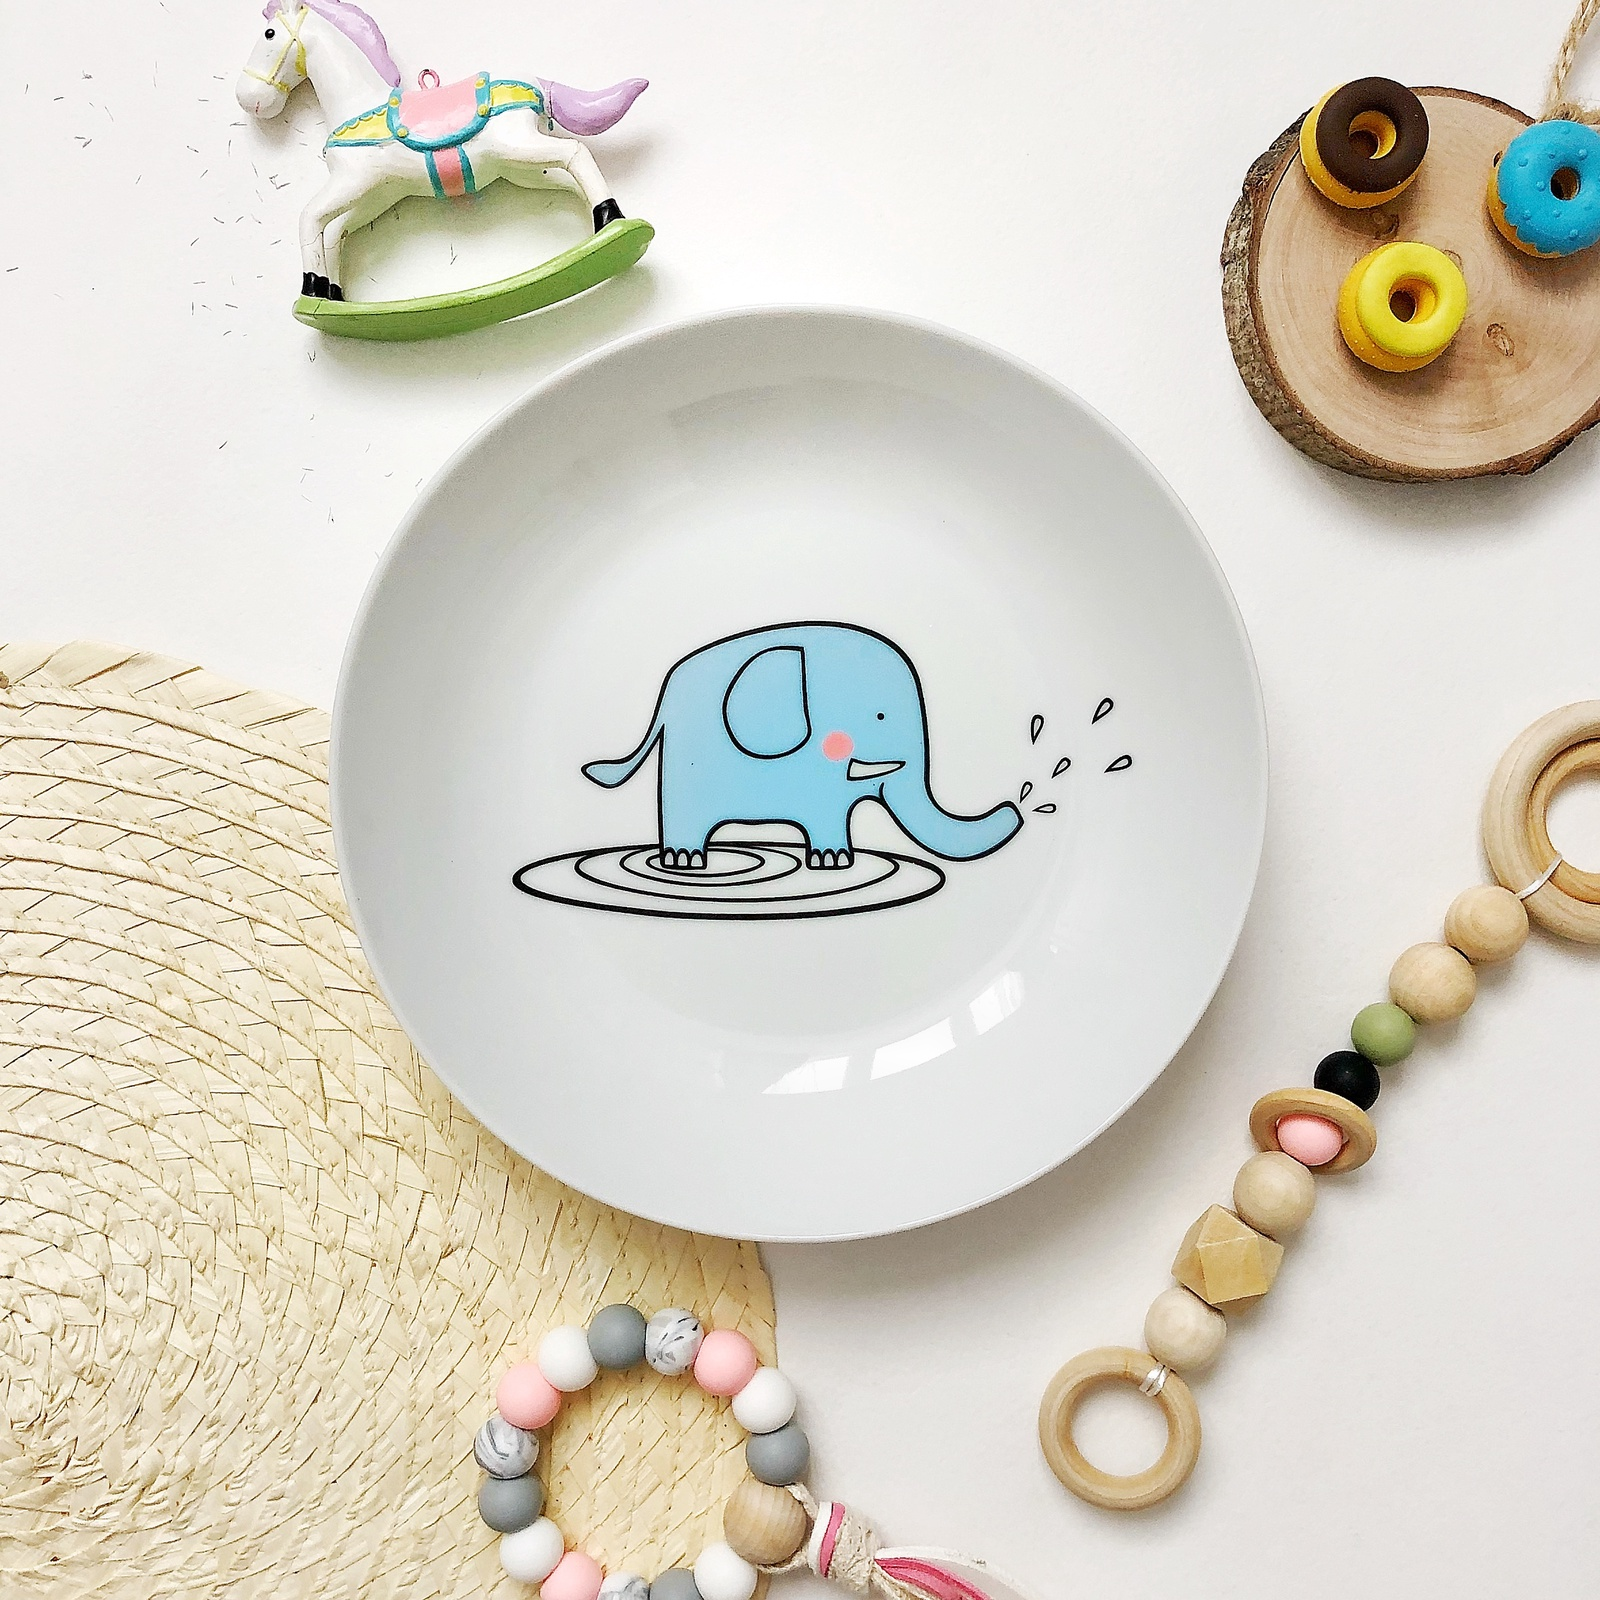 Тарелка глубокая Слон Бубон Sans Brides 20 см арт. 0051-00474-000_3 тарелка мелкая сотвори чудо маленький принц faien диаметр 20 см